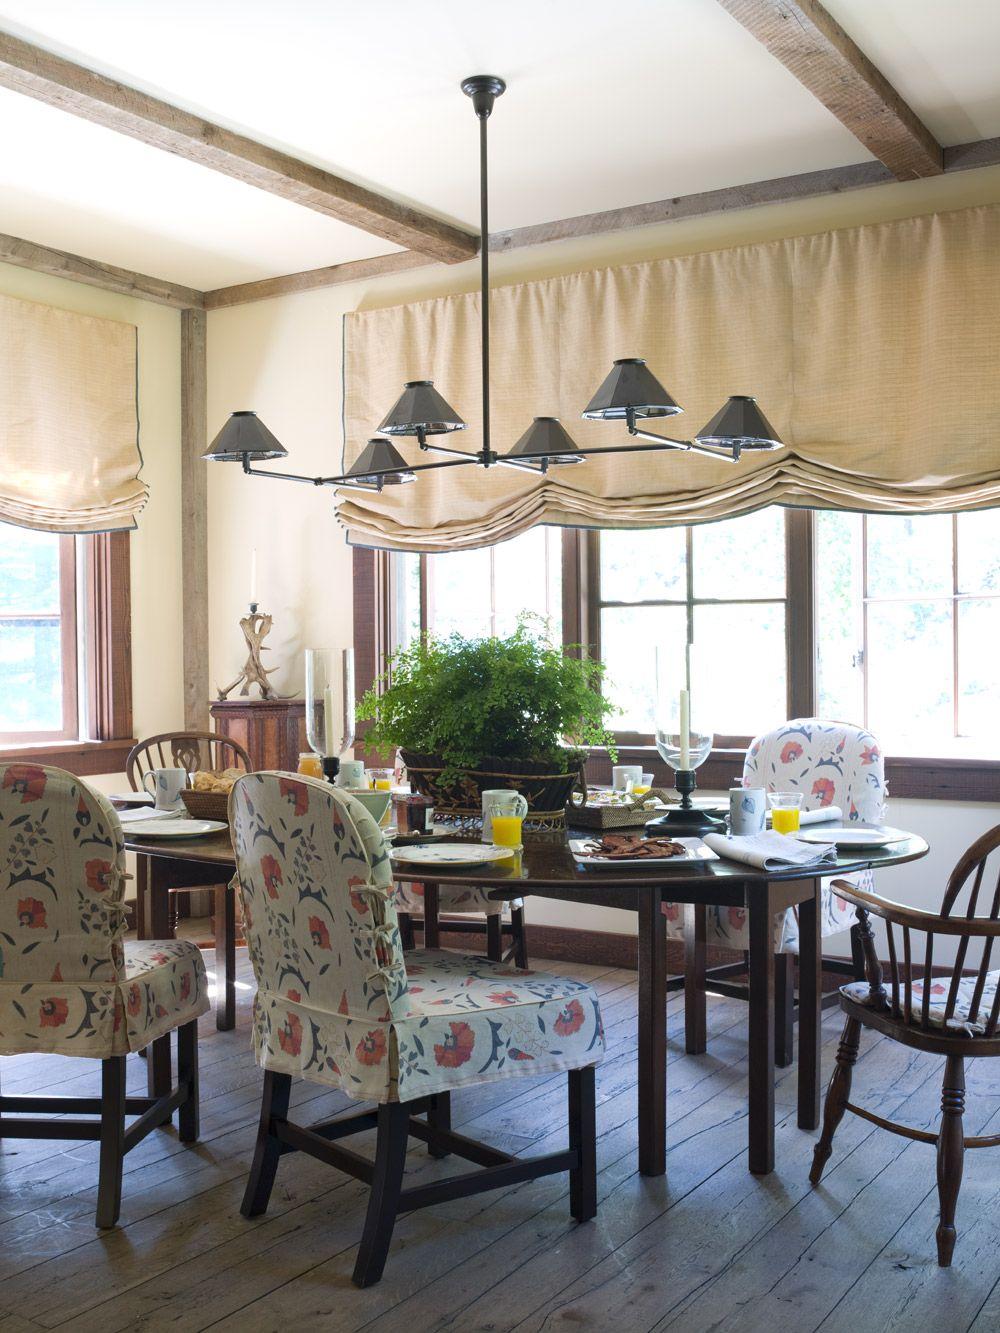 Window coverings of idaho  mountain retreat dining room photo by pieter estersohn  drapery